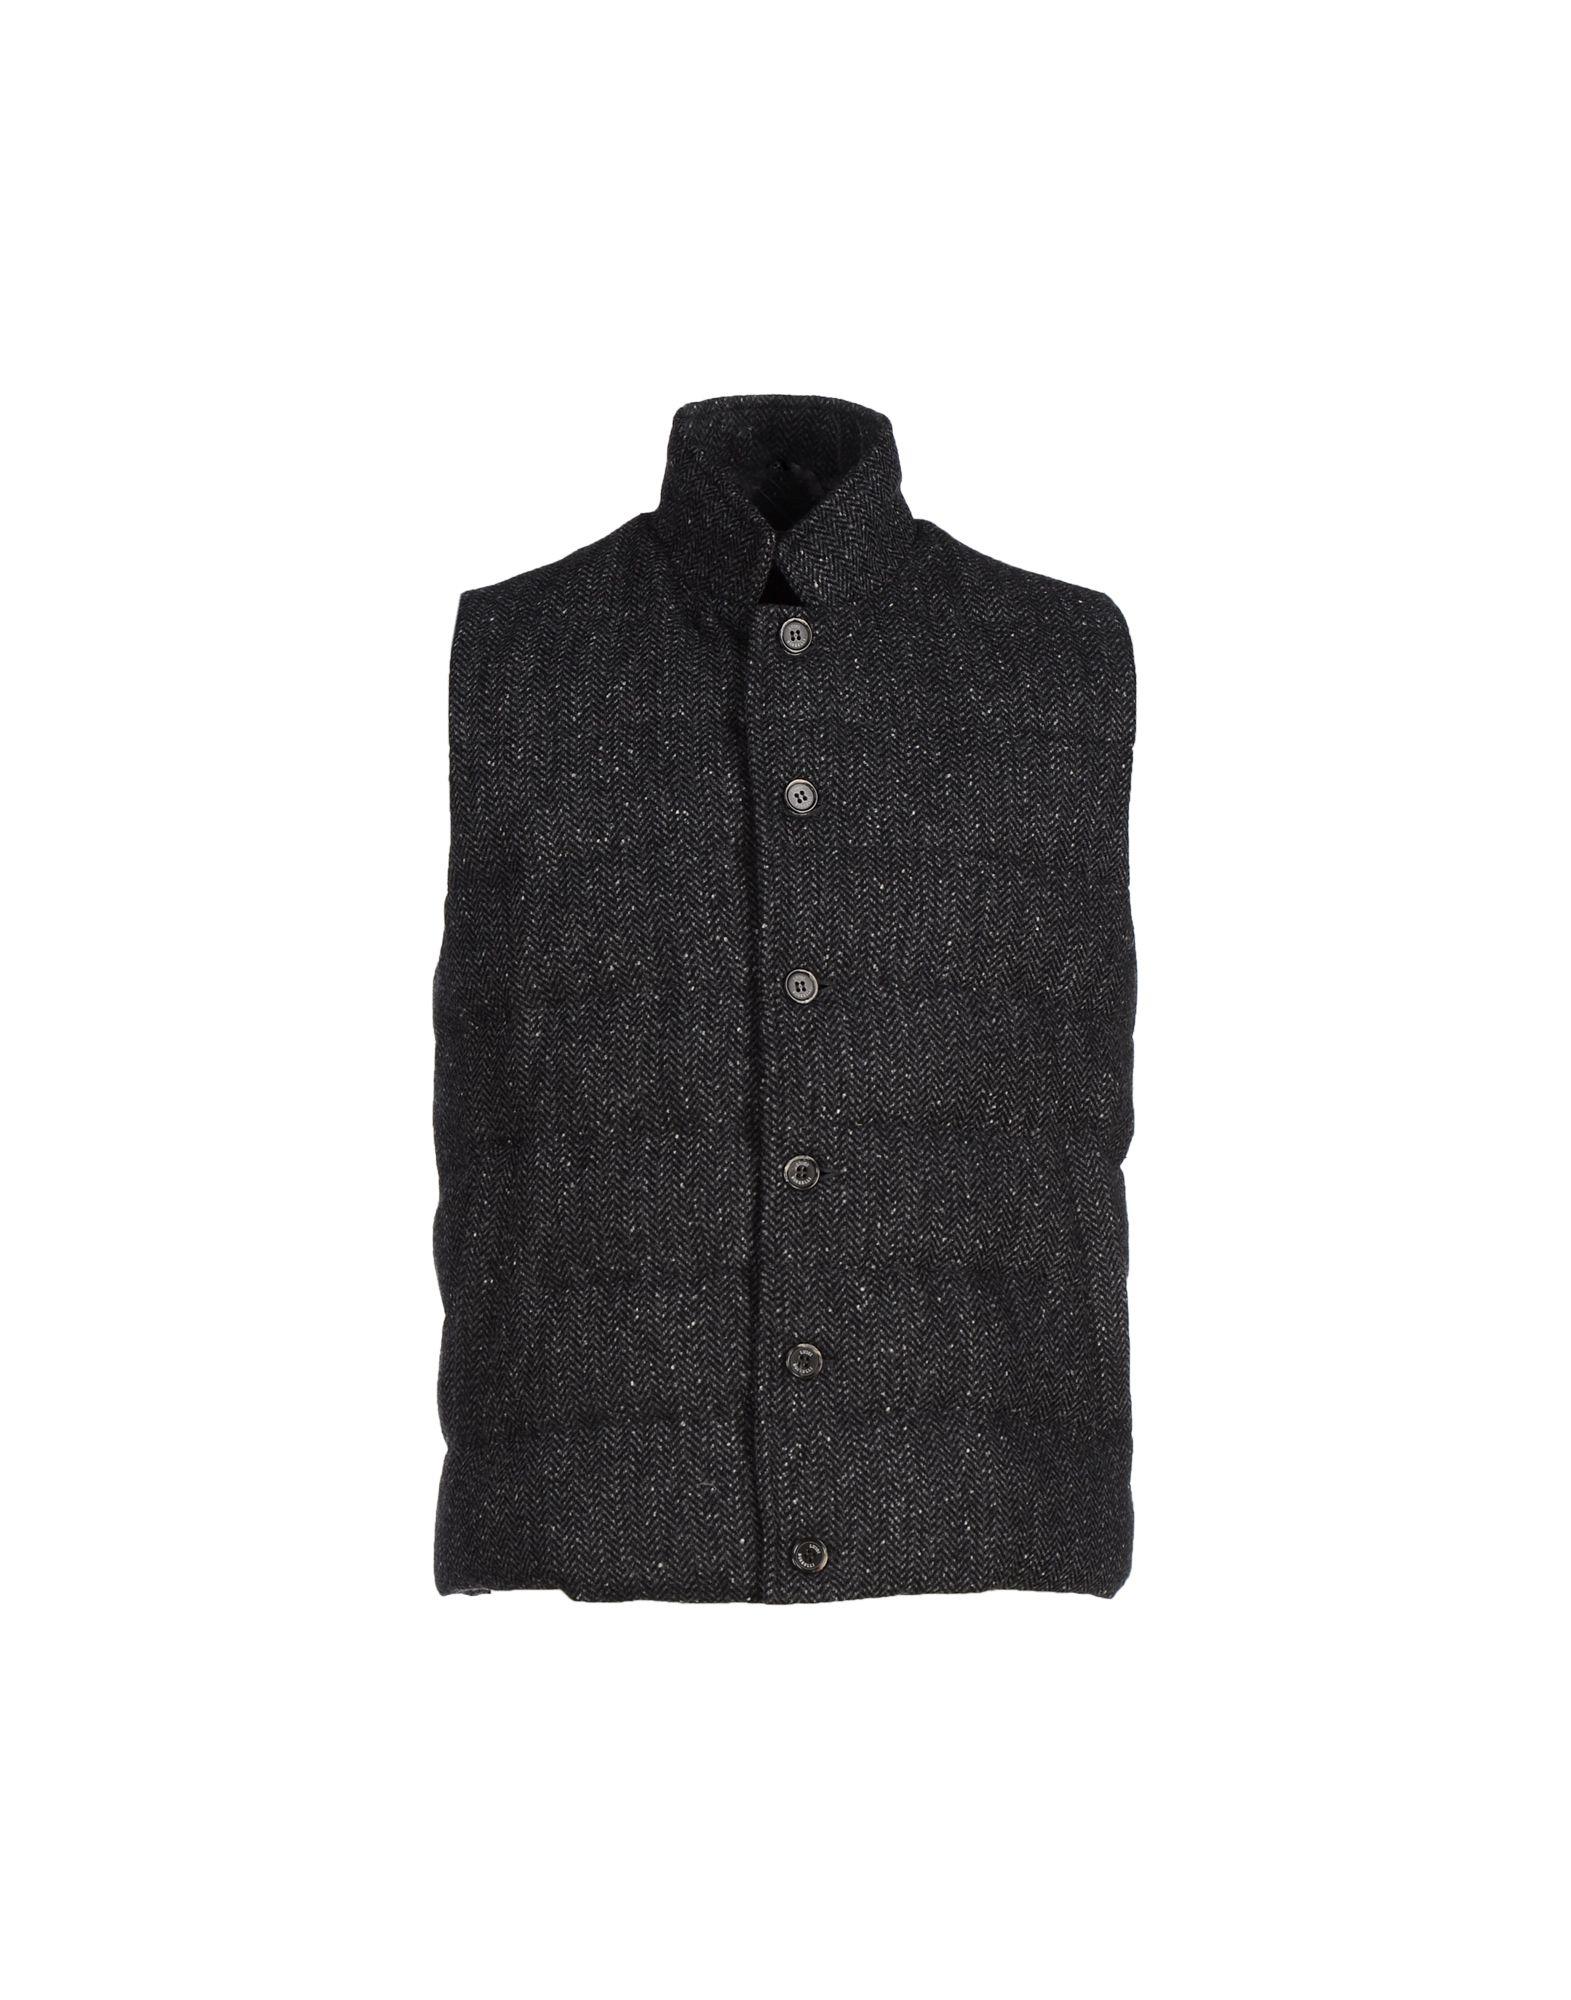 Gray Down For Luigi Napoli Lyst Jacket Men Borrelli In wawgqOX